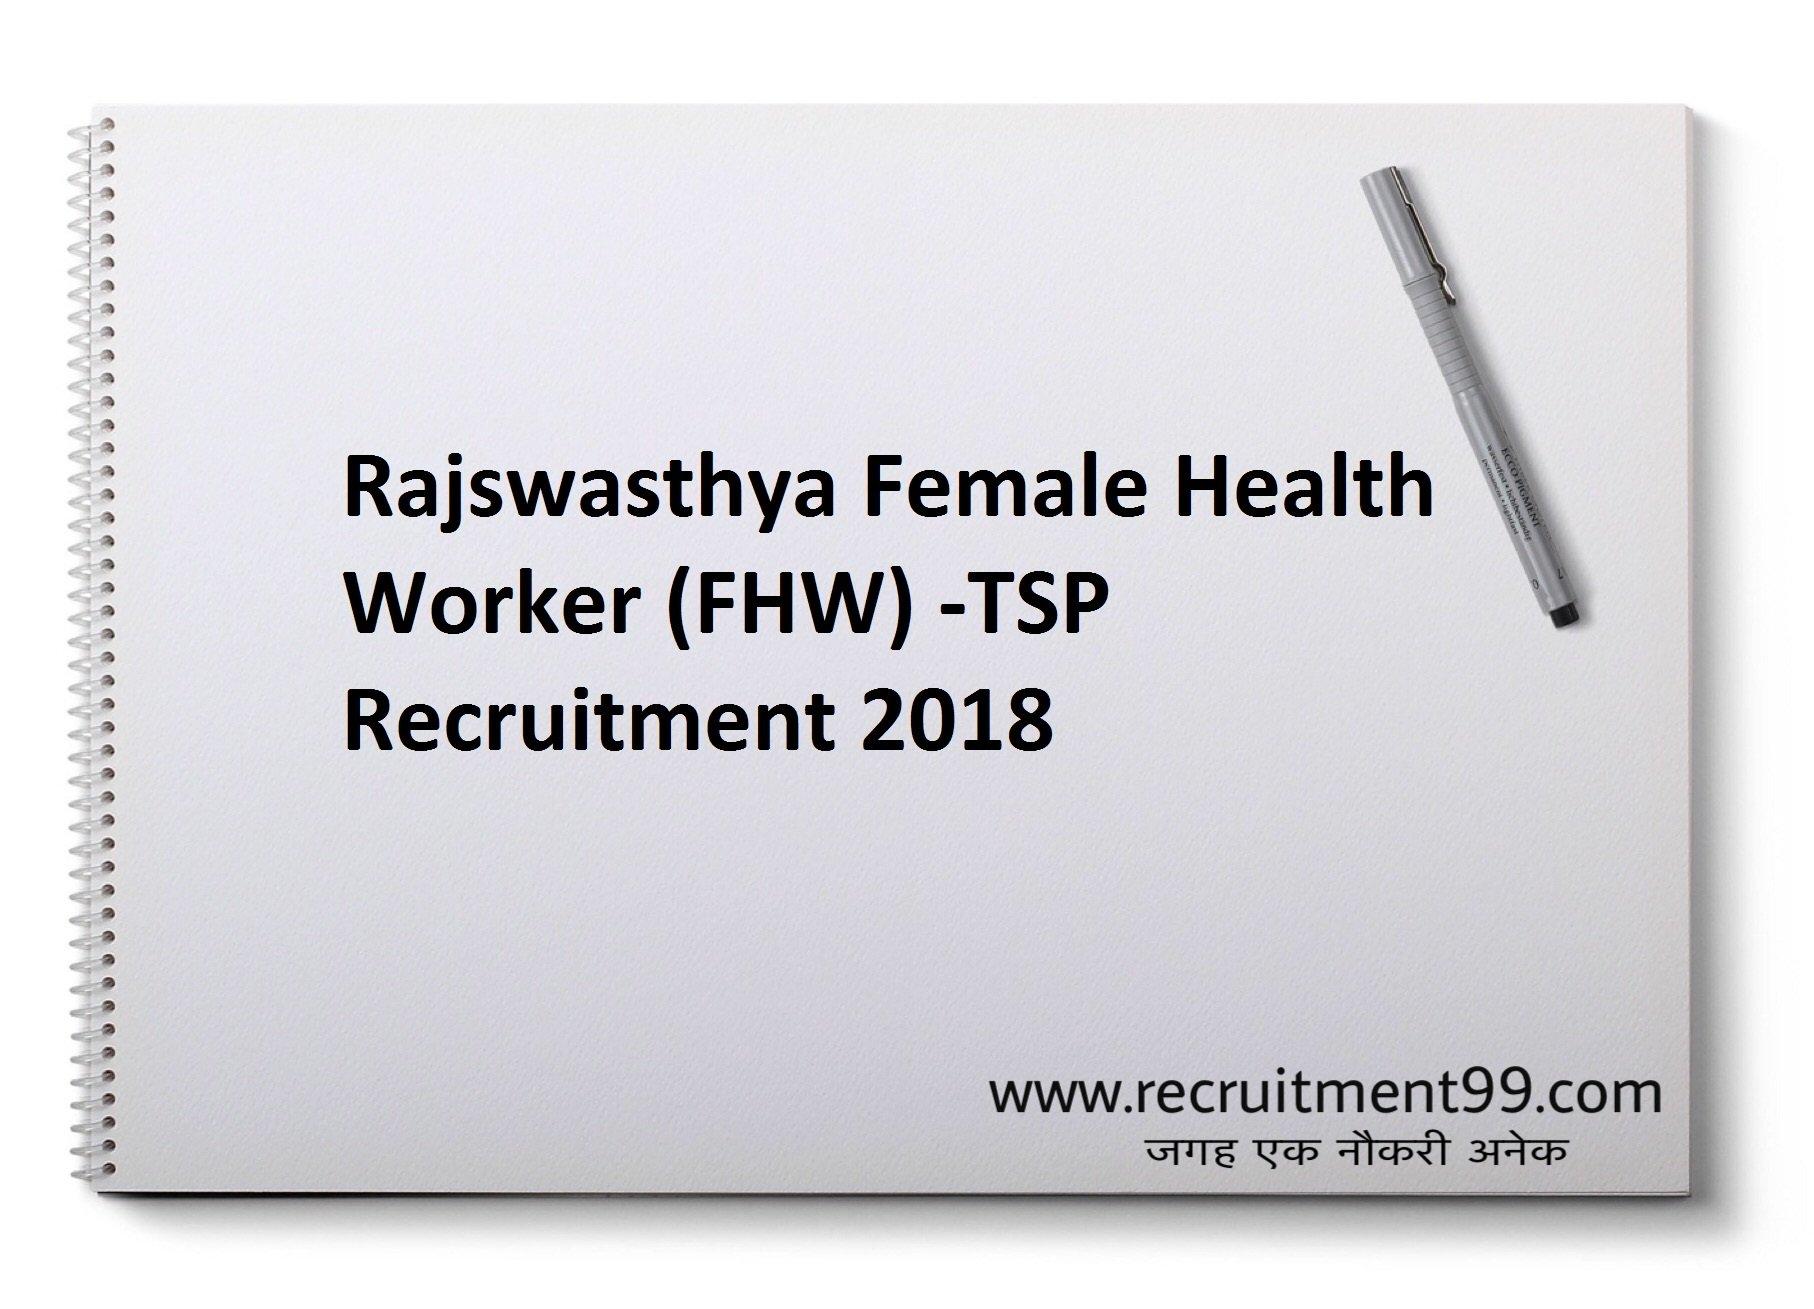 Rajswasthya Female Health Worker (FHW) Recruitment Admit Card Result 2018